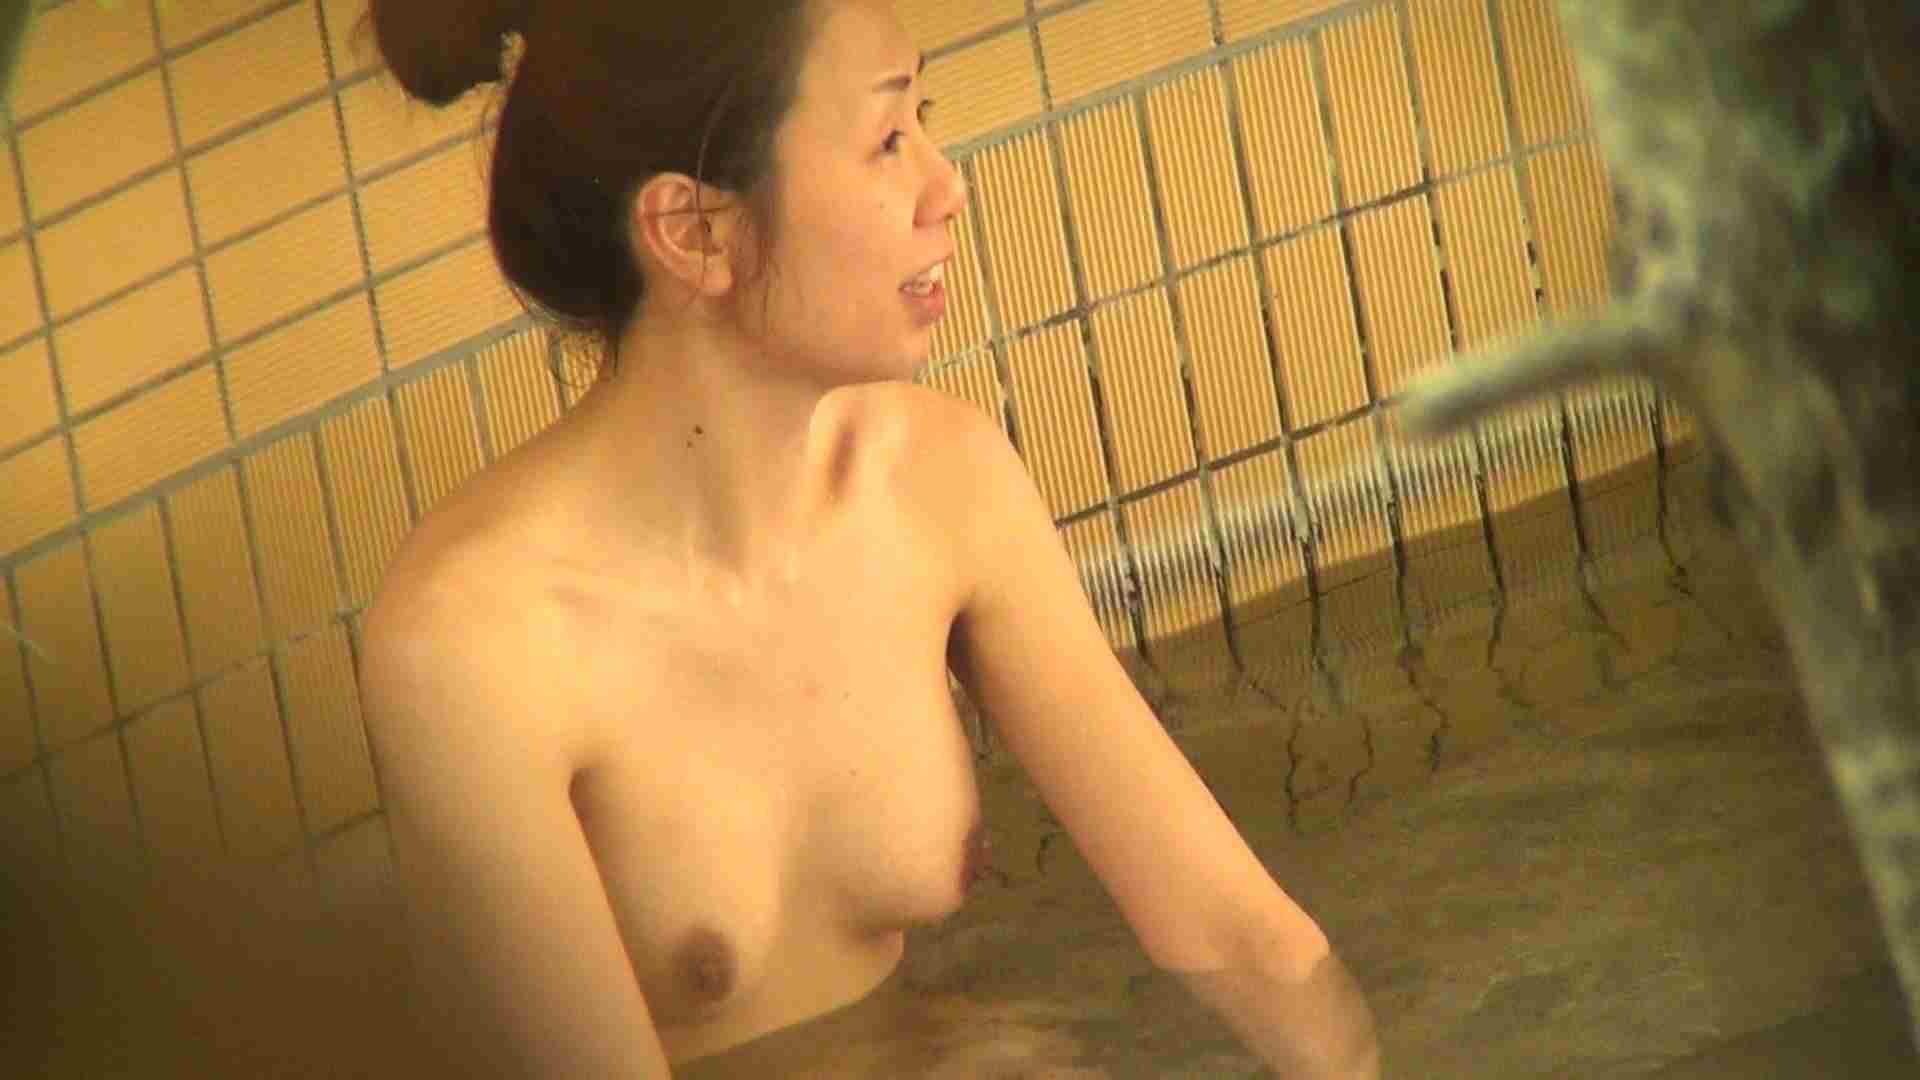 Aquaな露天風呂Vol.312 エッチな盗撮 AV無料 109pic 23